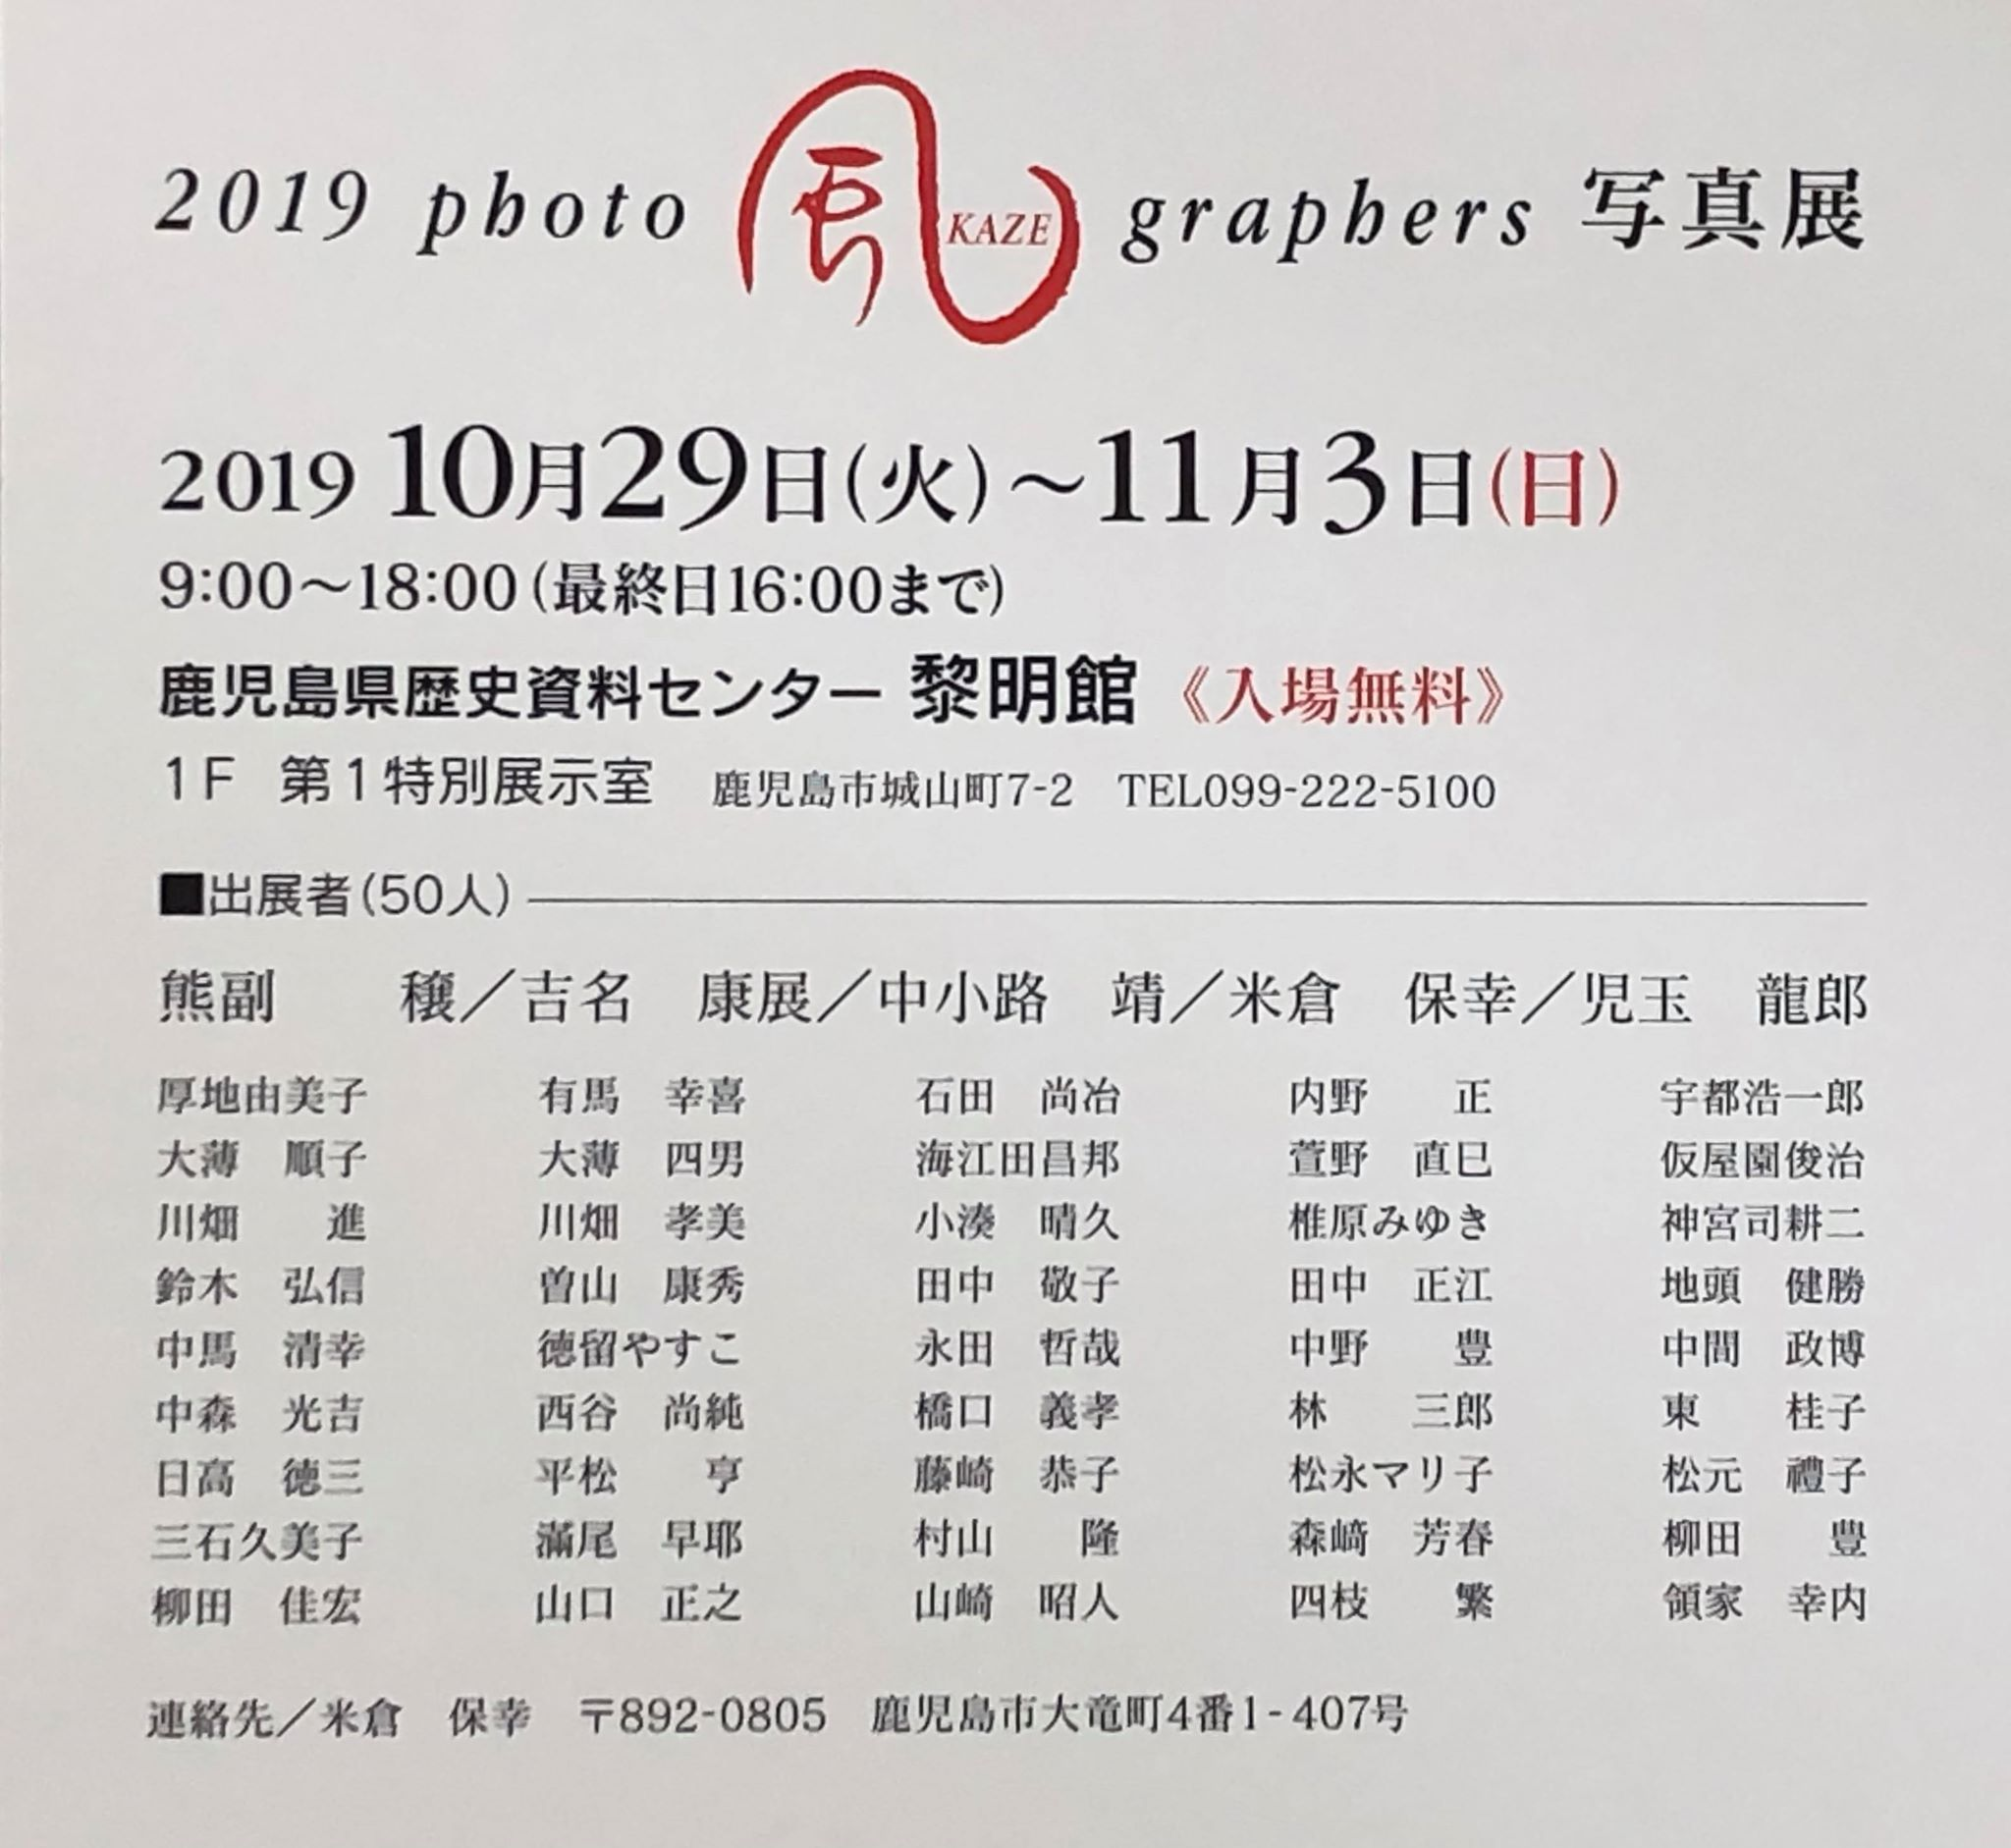 2019photographers写真展